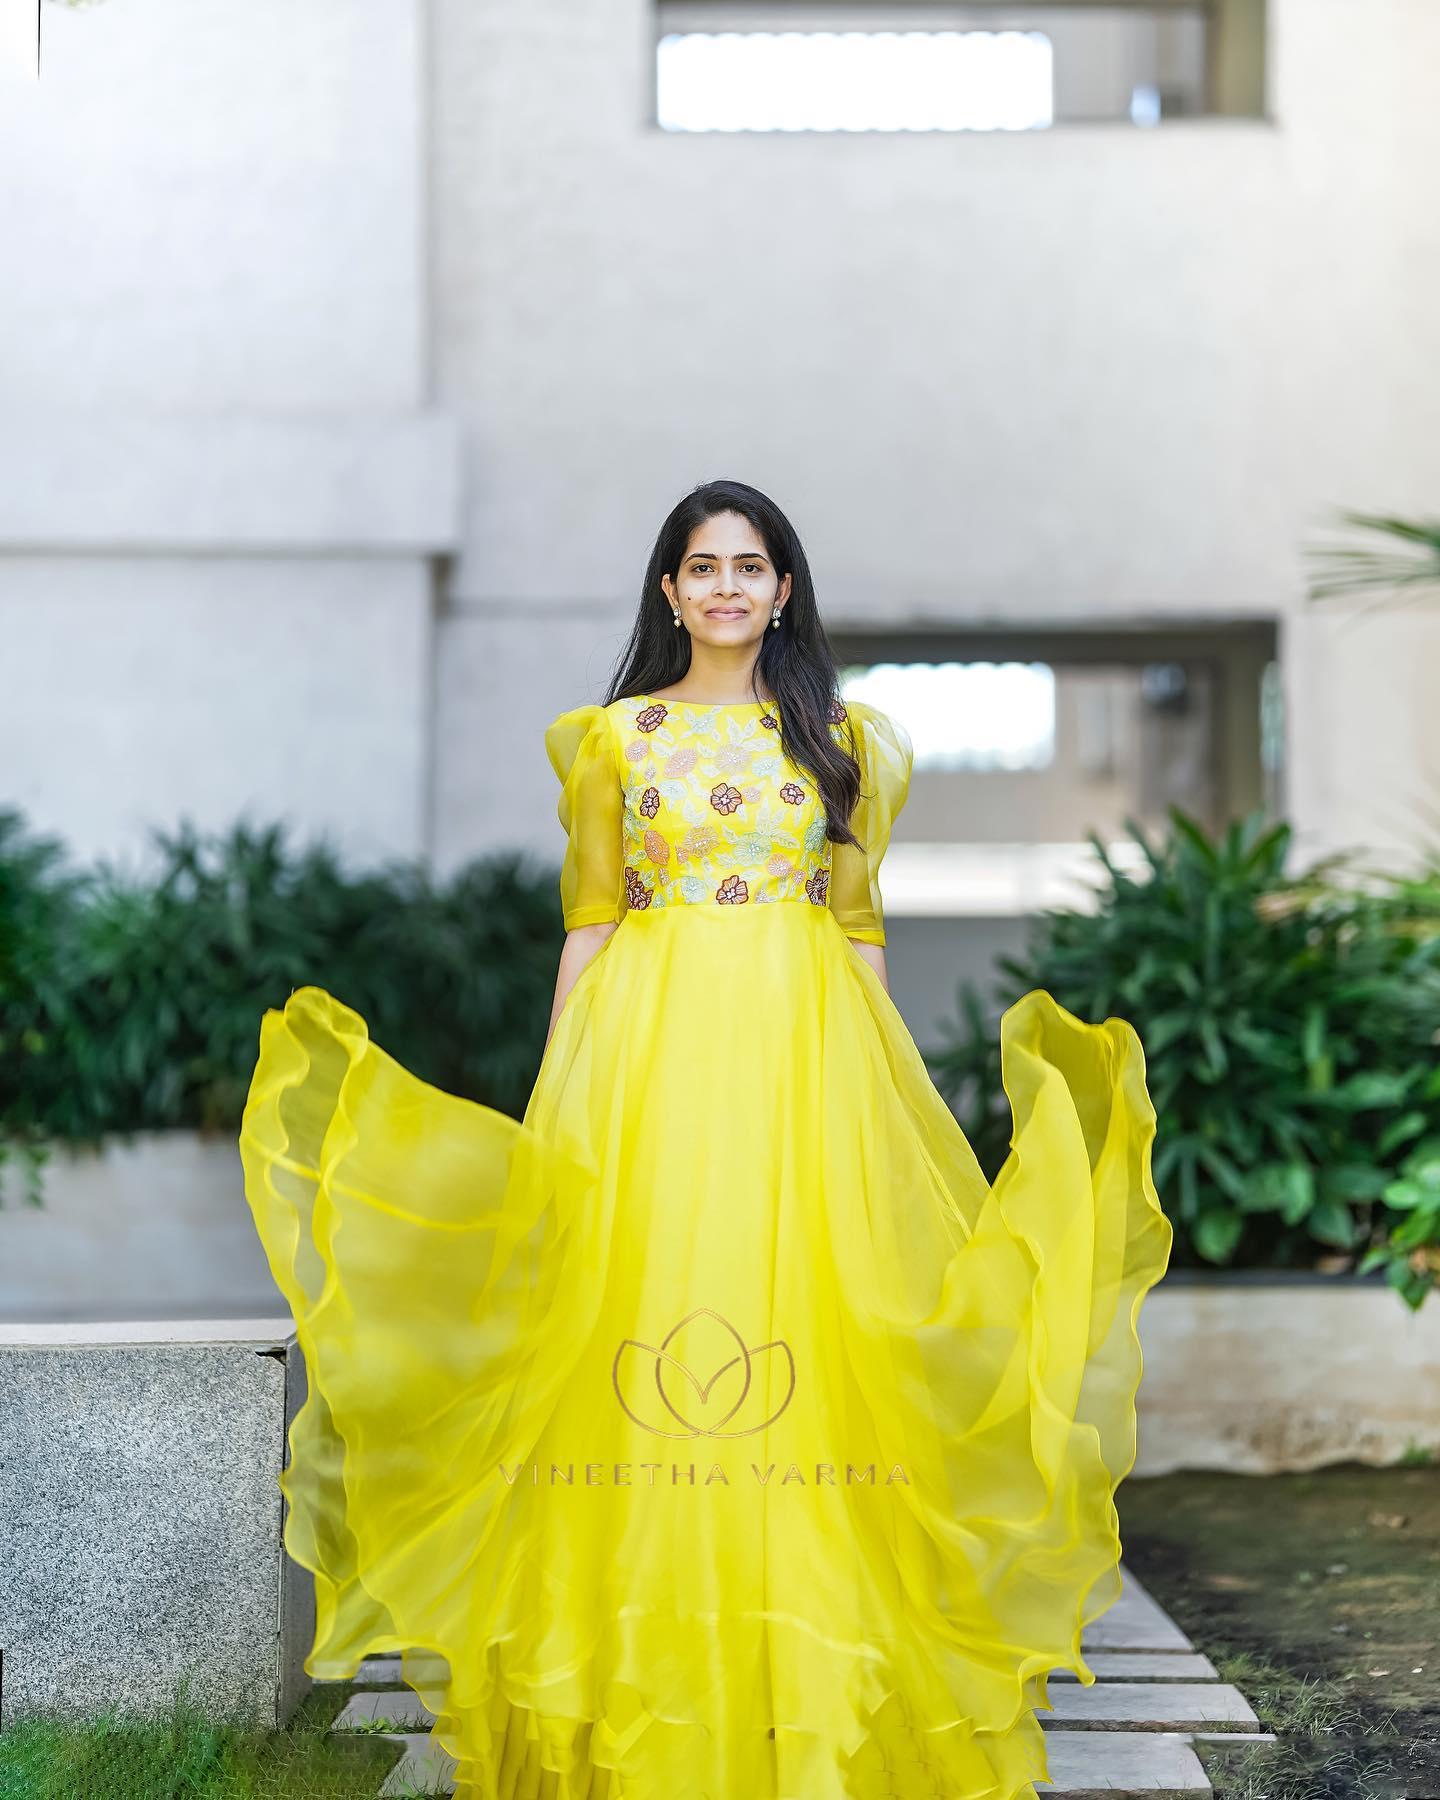 Applique work pure organza long dress. ISHYA. Price : 9800.00 2021-10-21